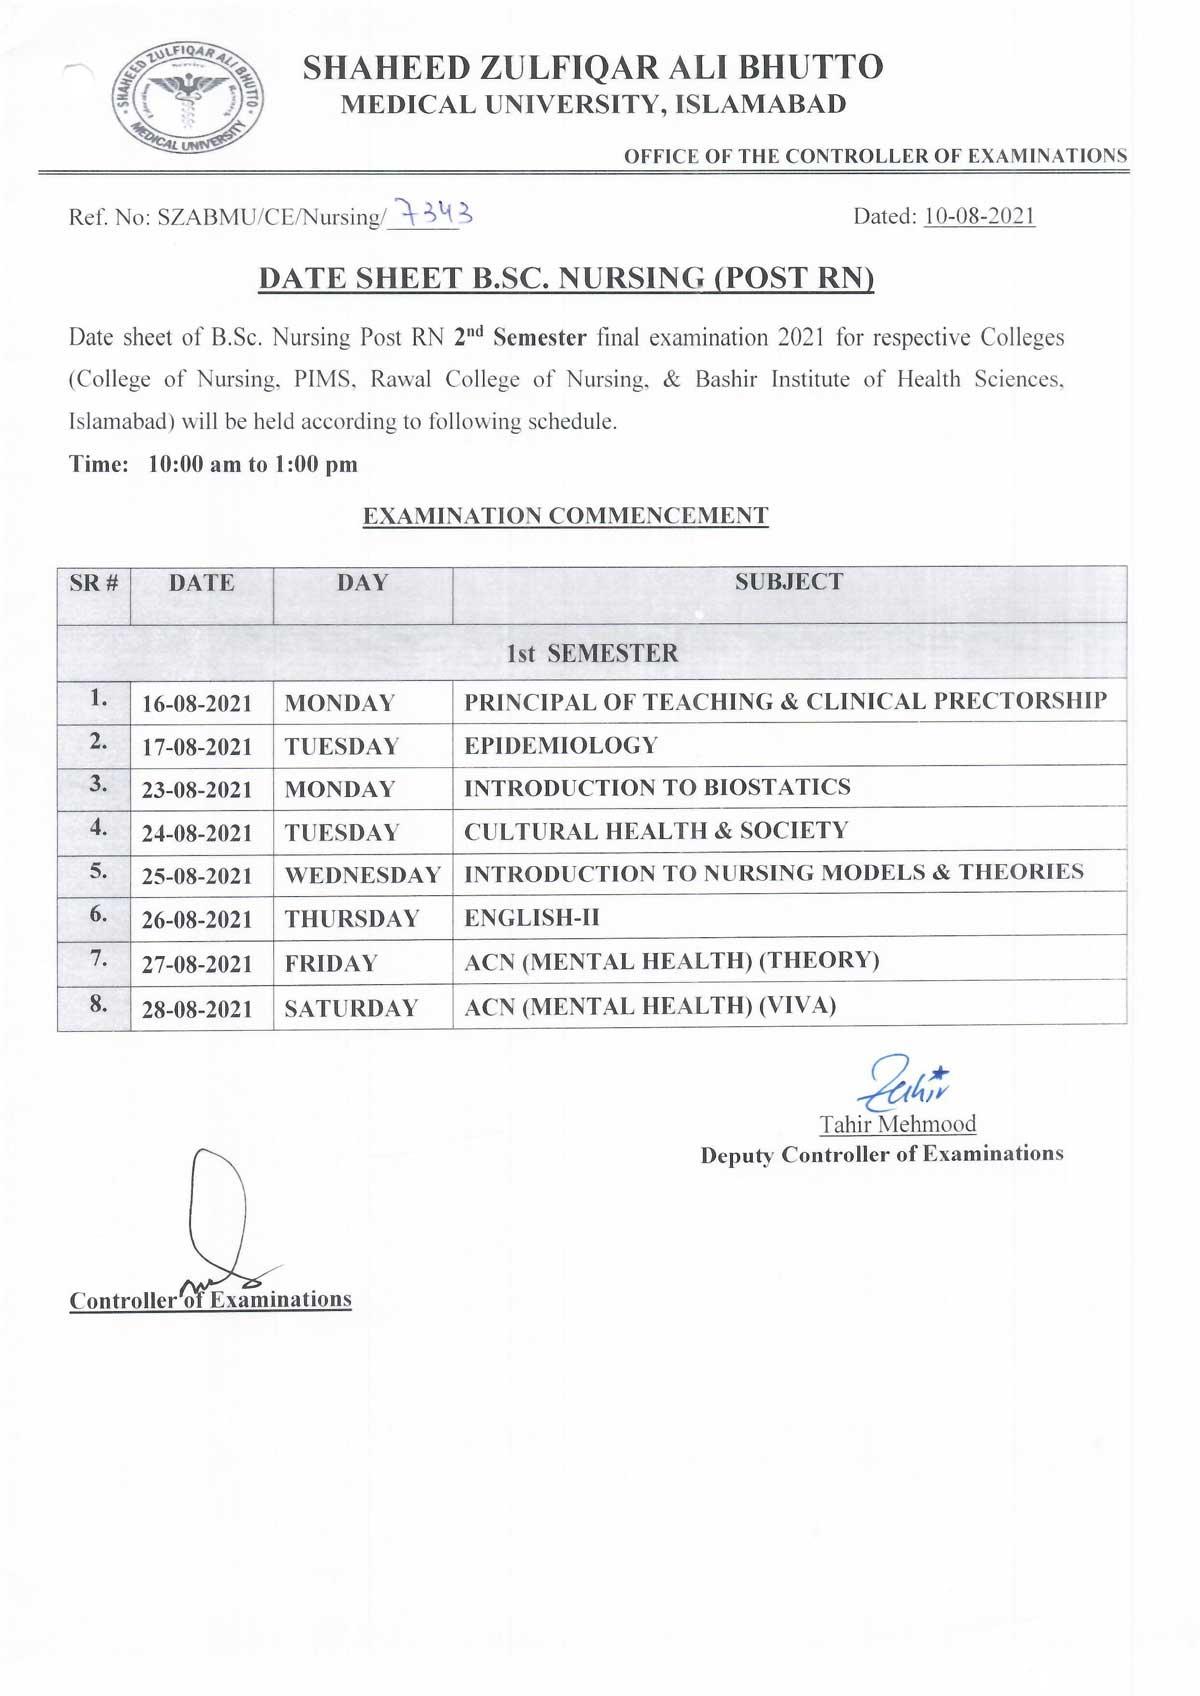 Date Sheet - B.Sc. Nursing Post RN 2nd semester final examination 2021